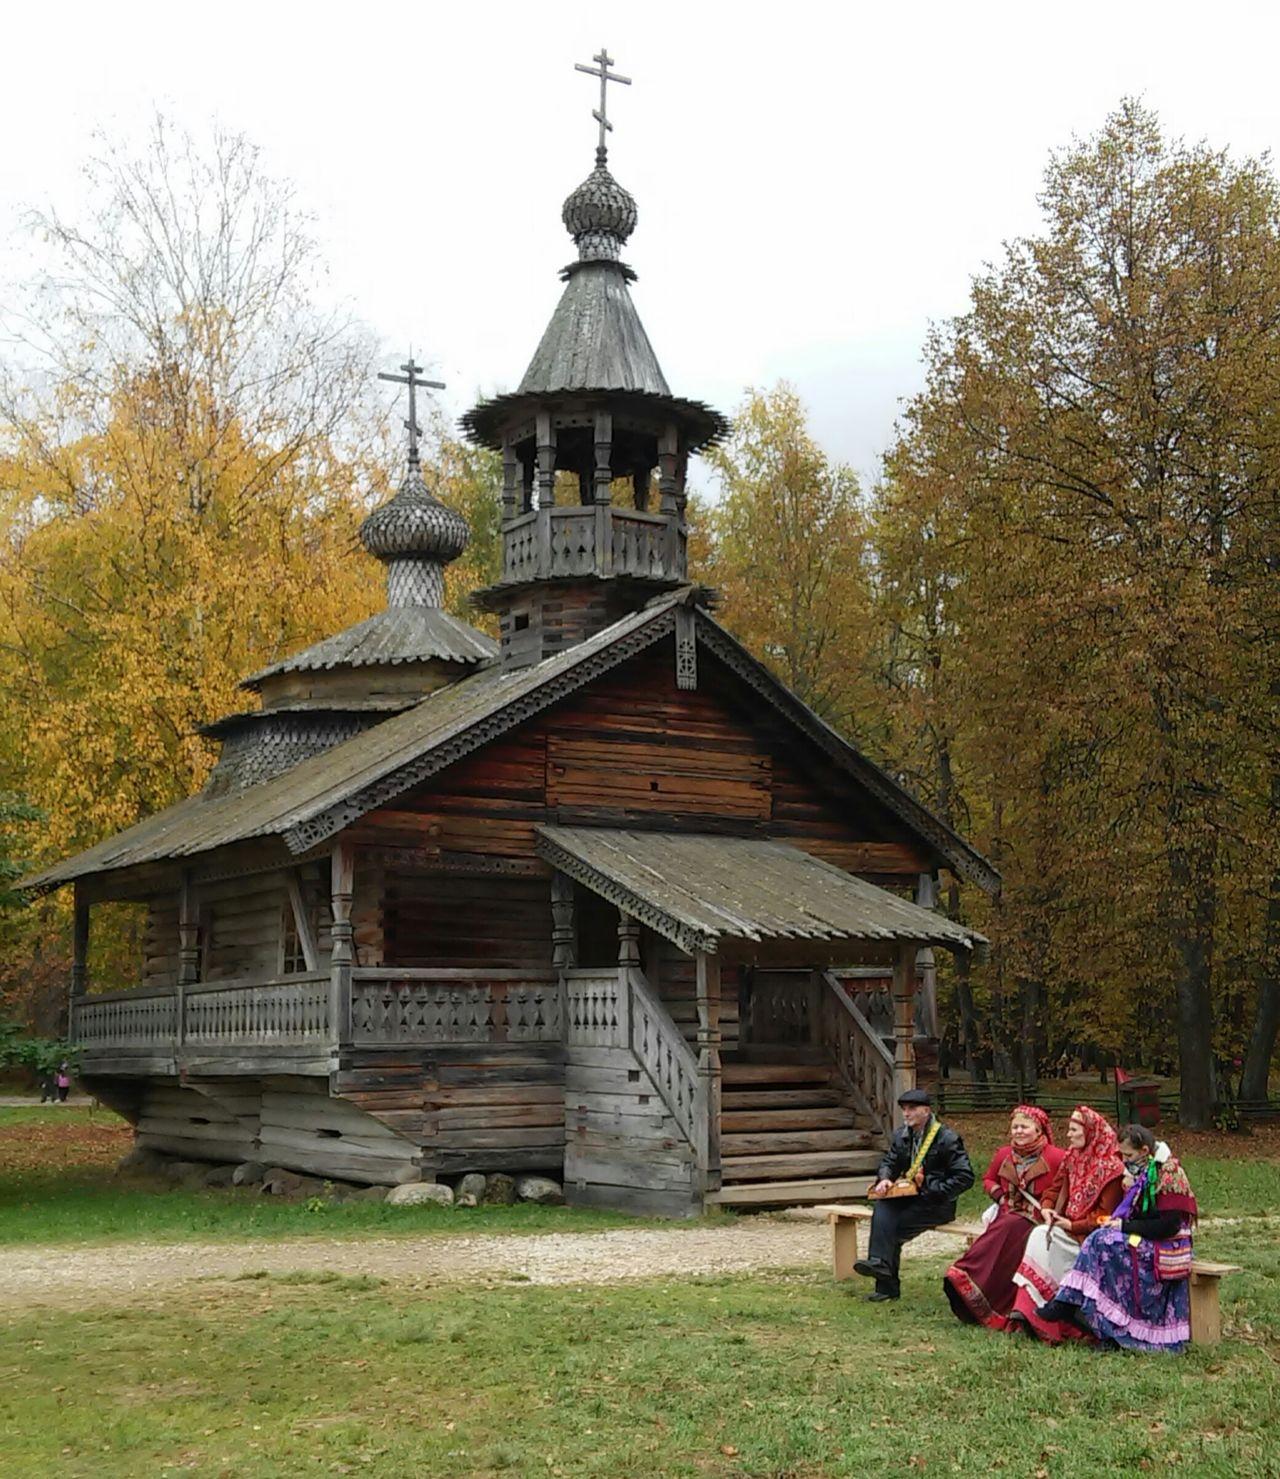 Architecture Autumn Grass National Outdoors People Tree Velikiy Novgorod